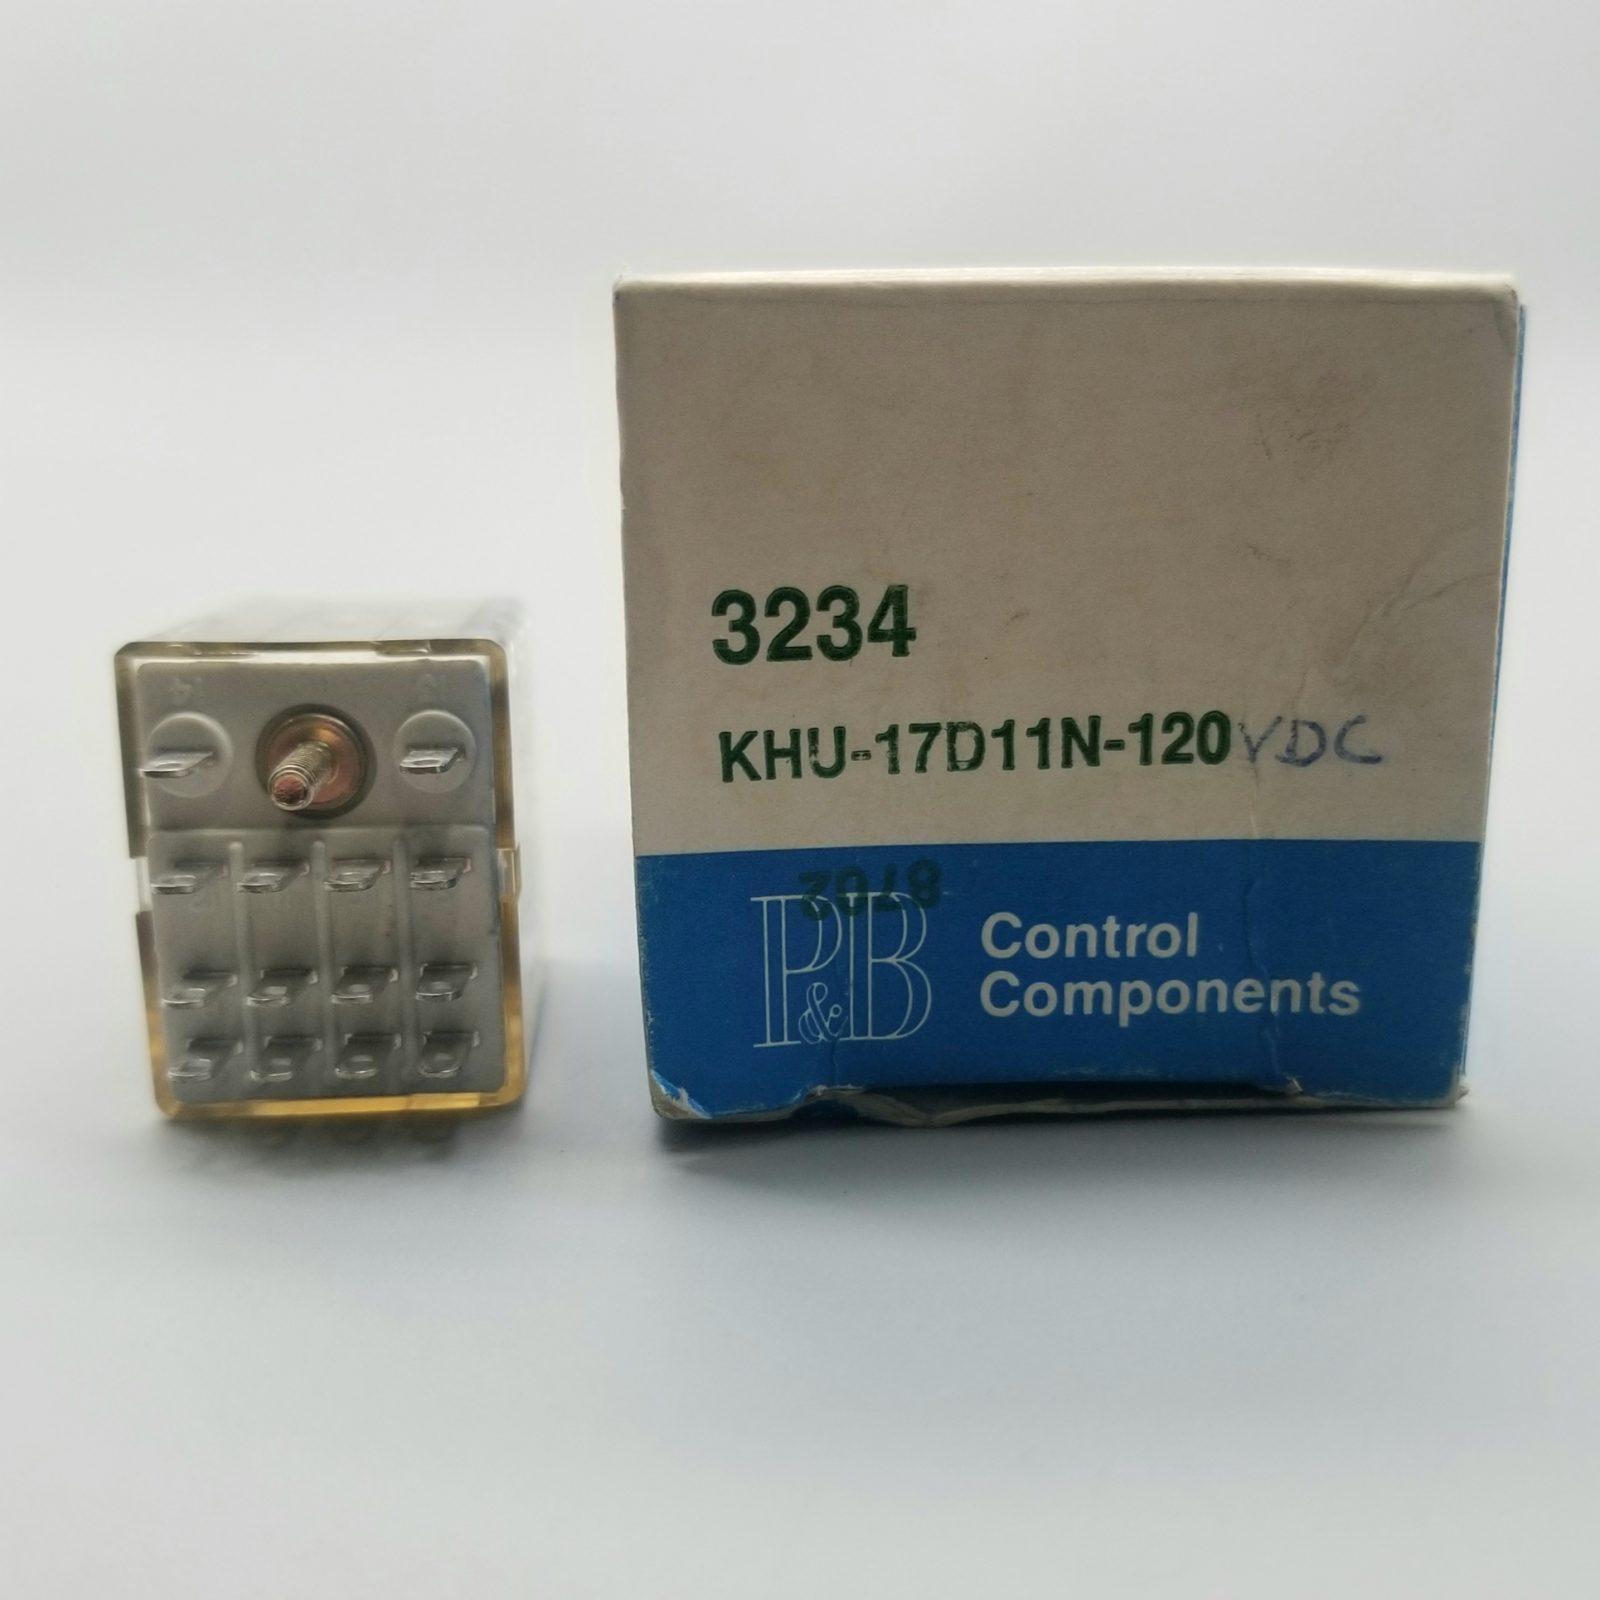 Potter & Brumfield KHU-17D11N-120 VDC Plug In Relay 120-VDC